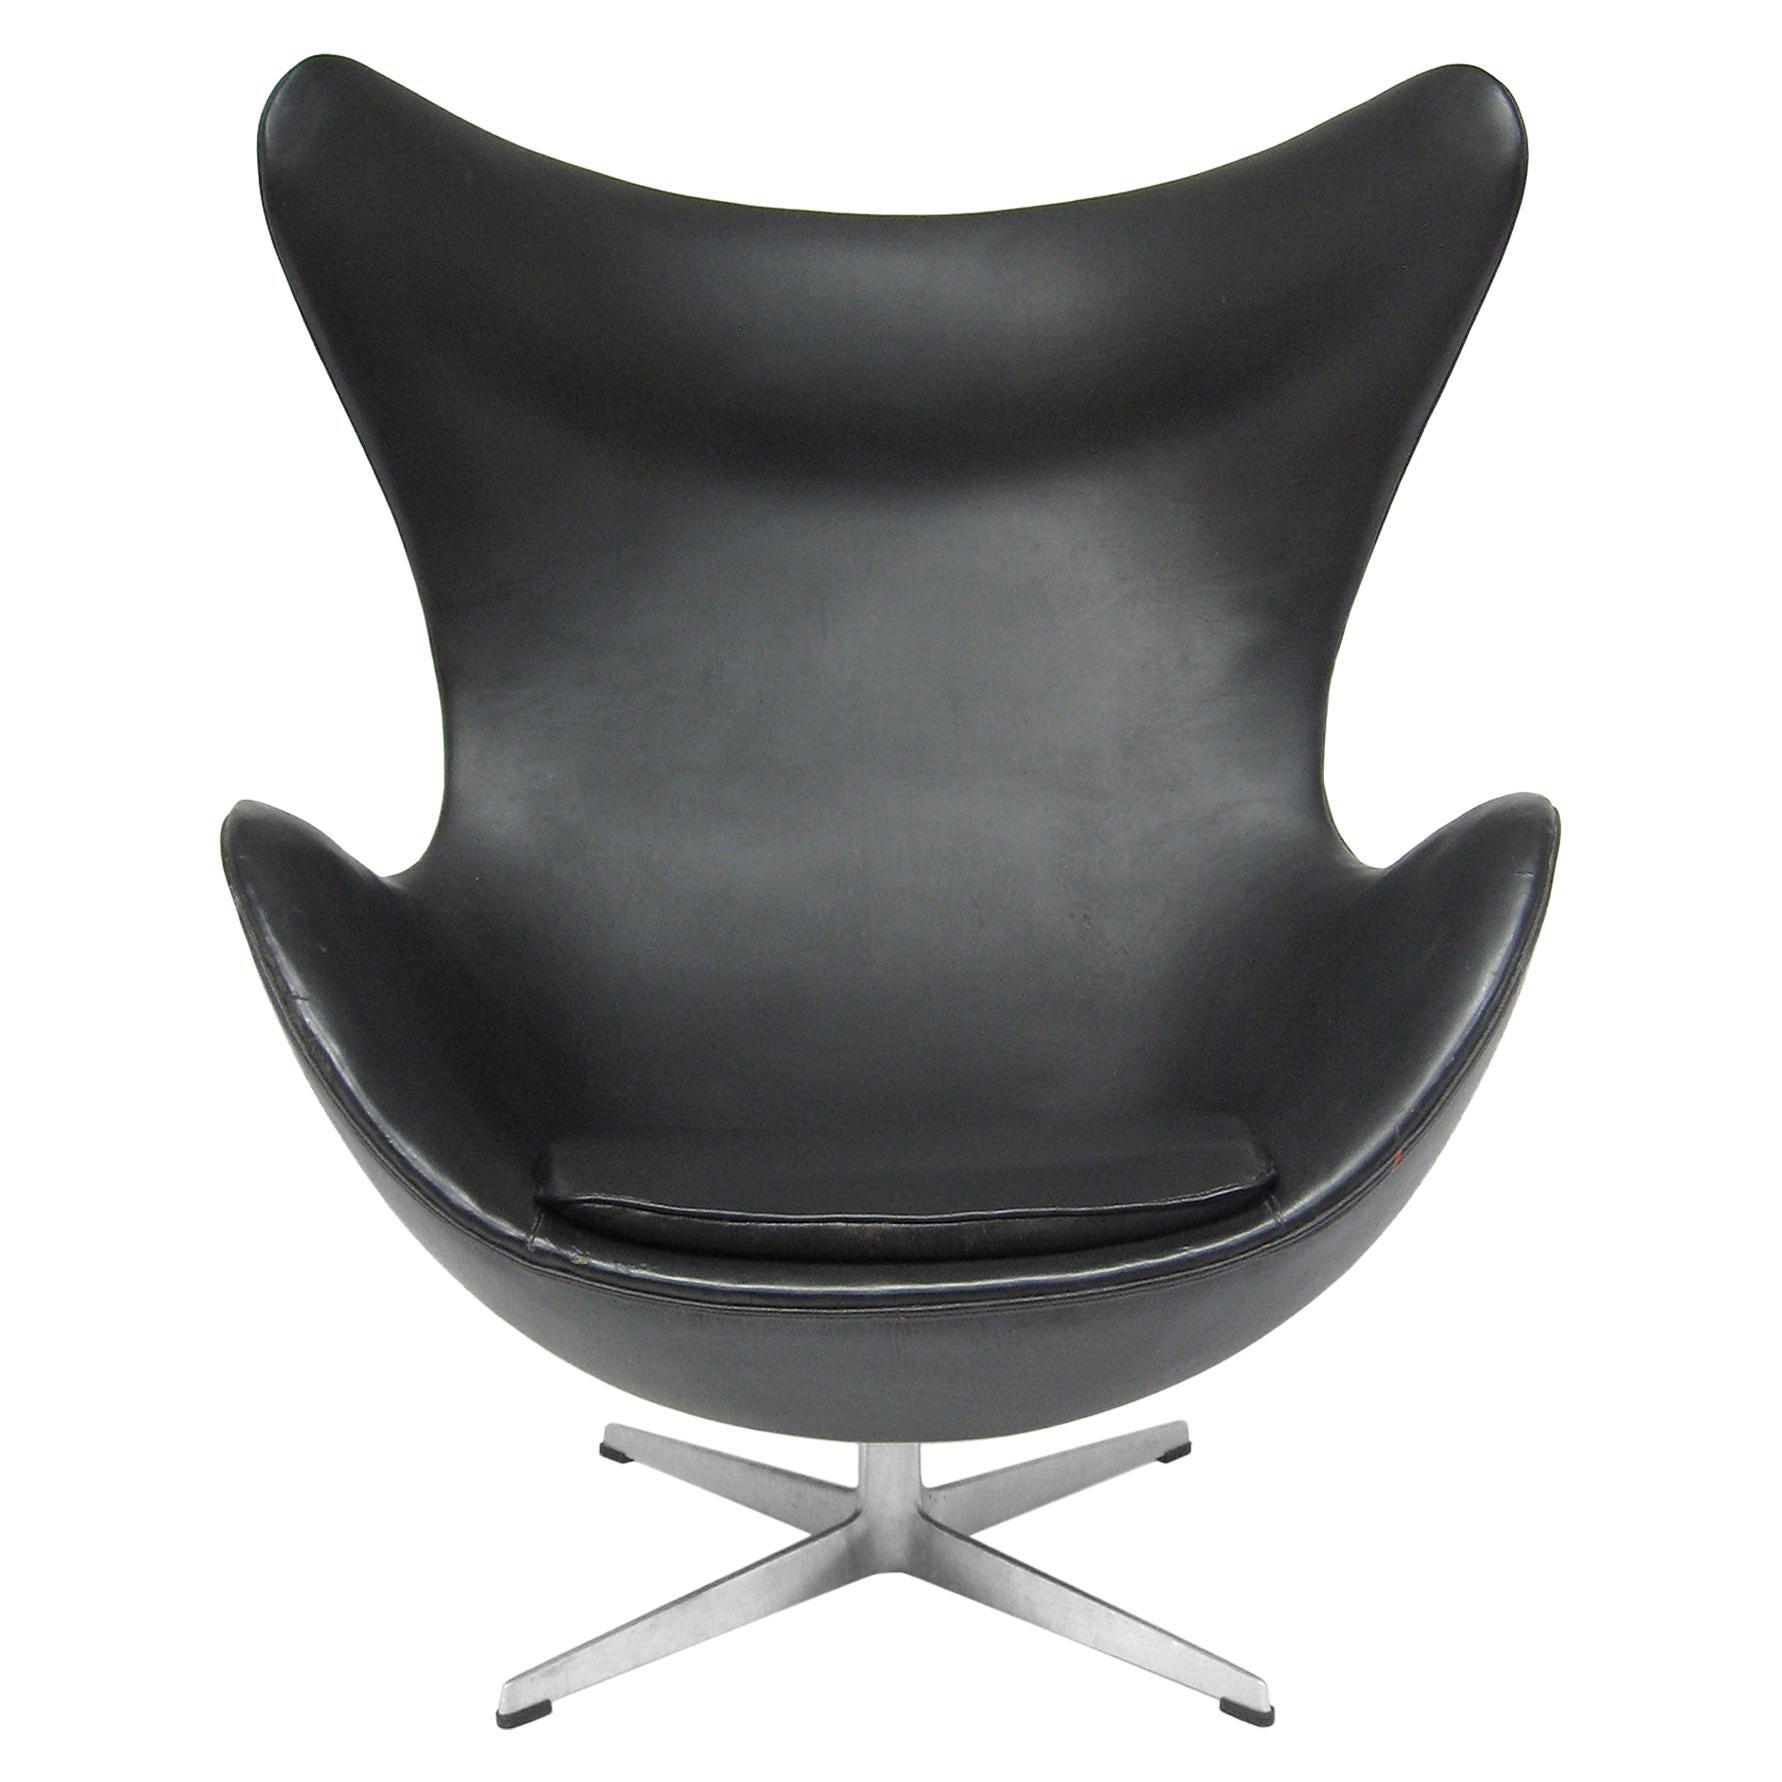 Arne Jacobsen Early Egg Chair by Fritz Hansen